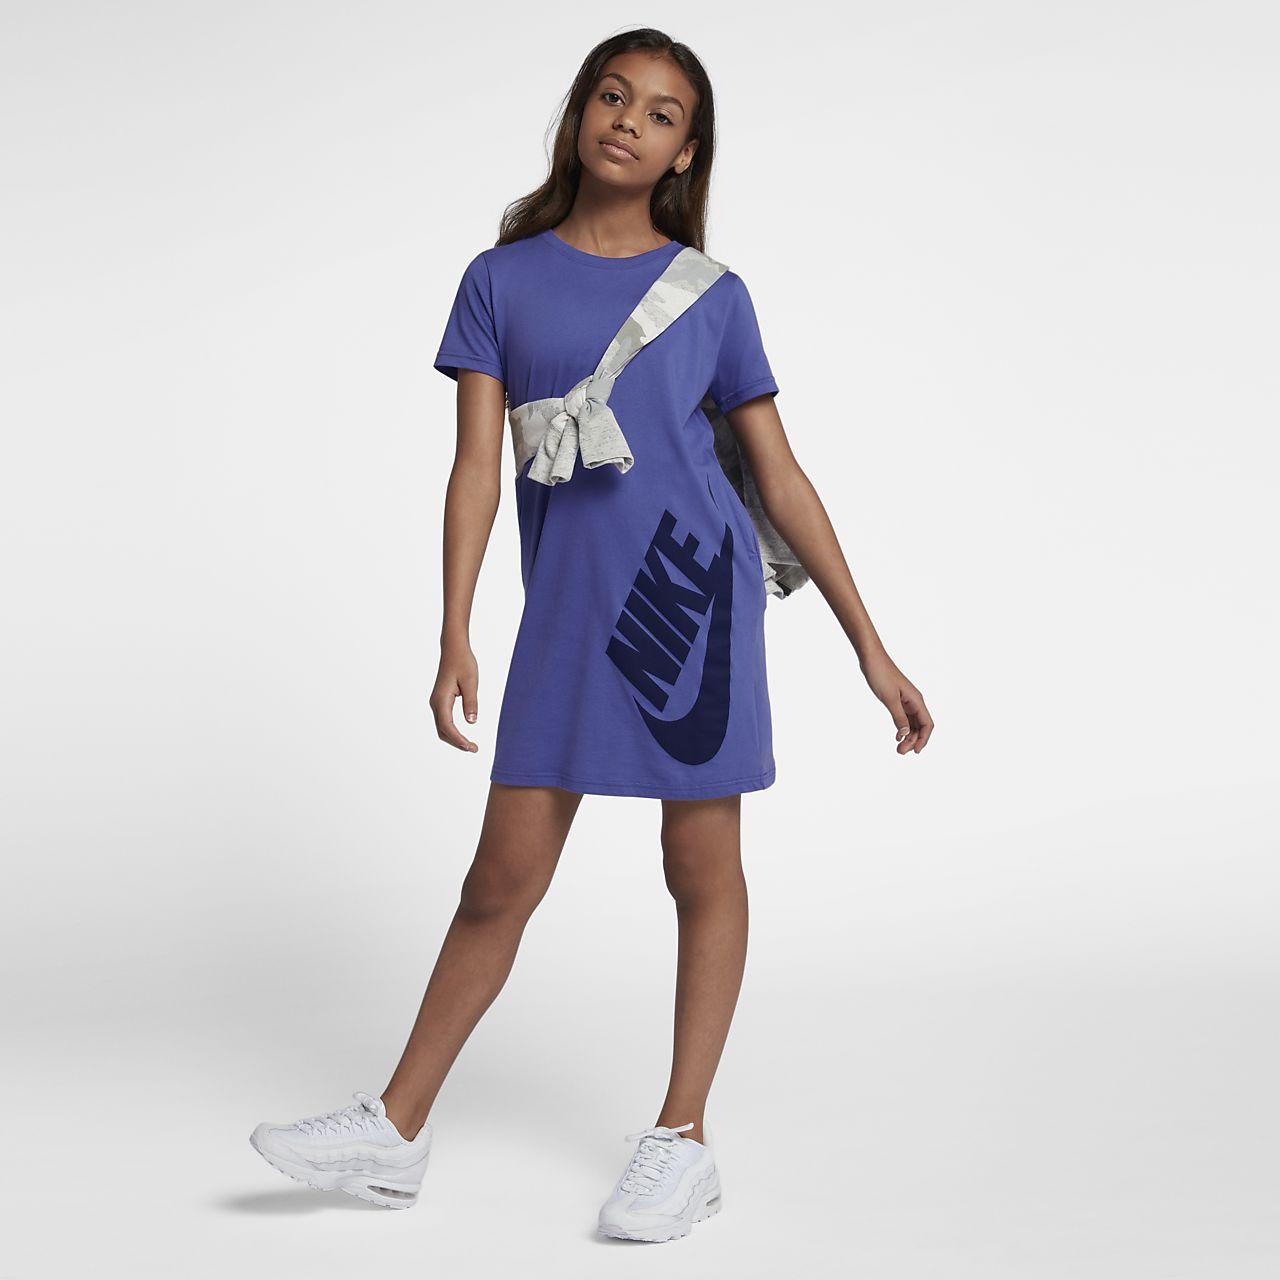 Shirtdress Dresses